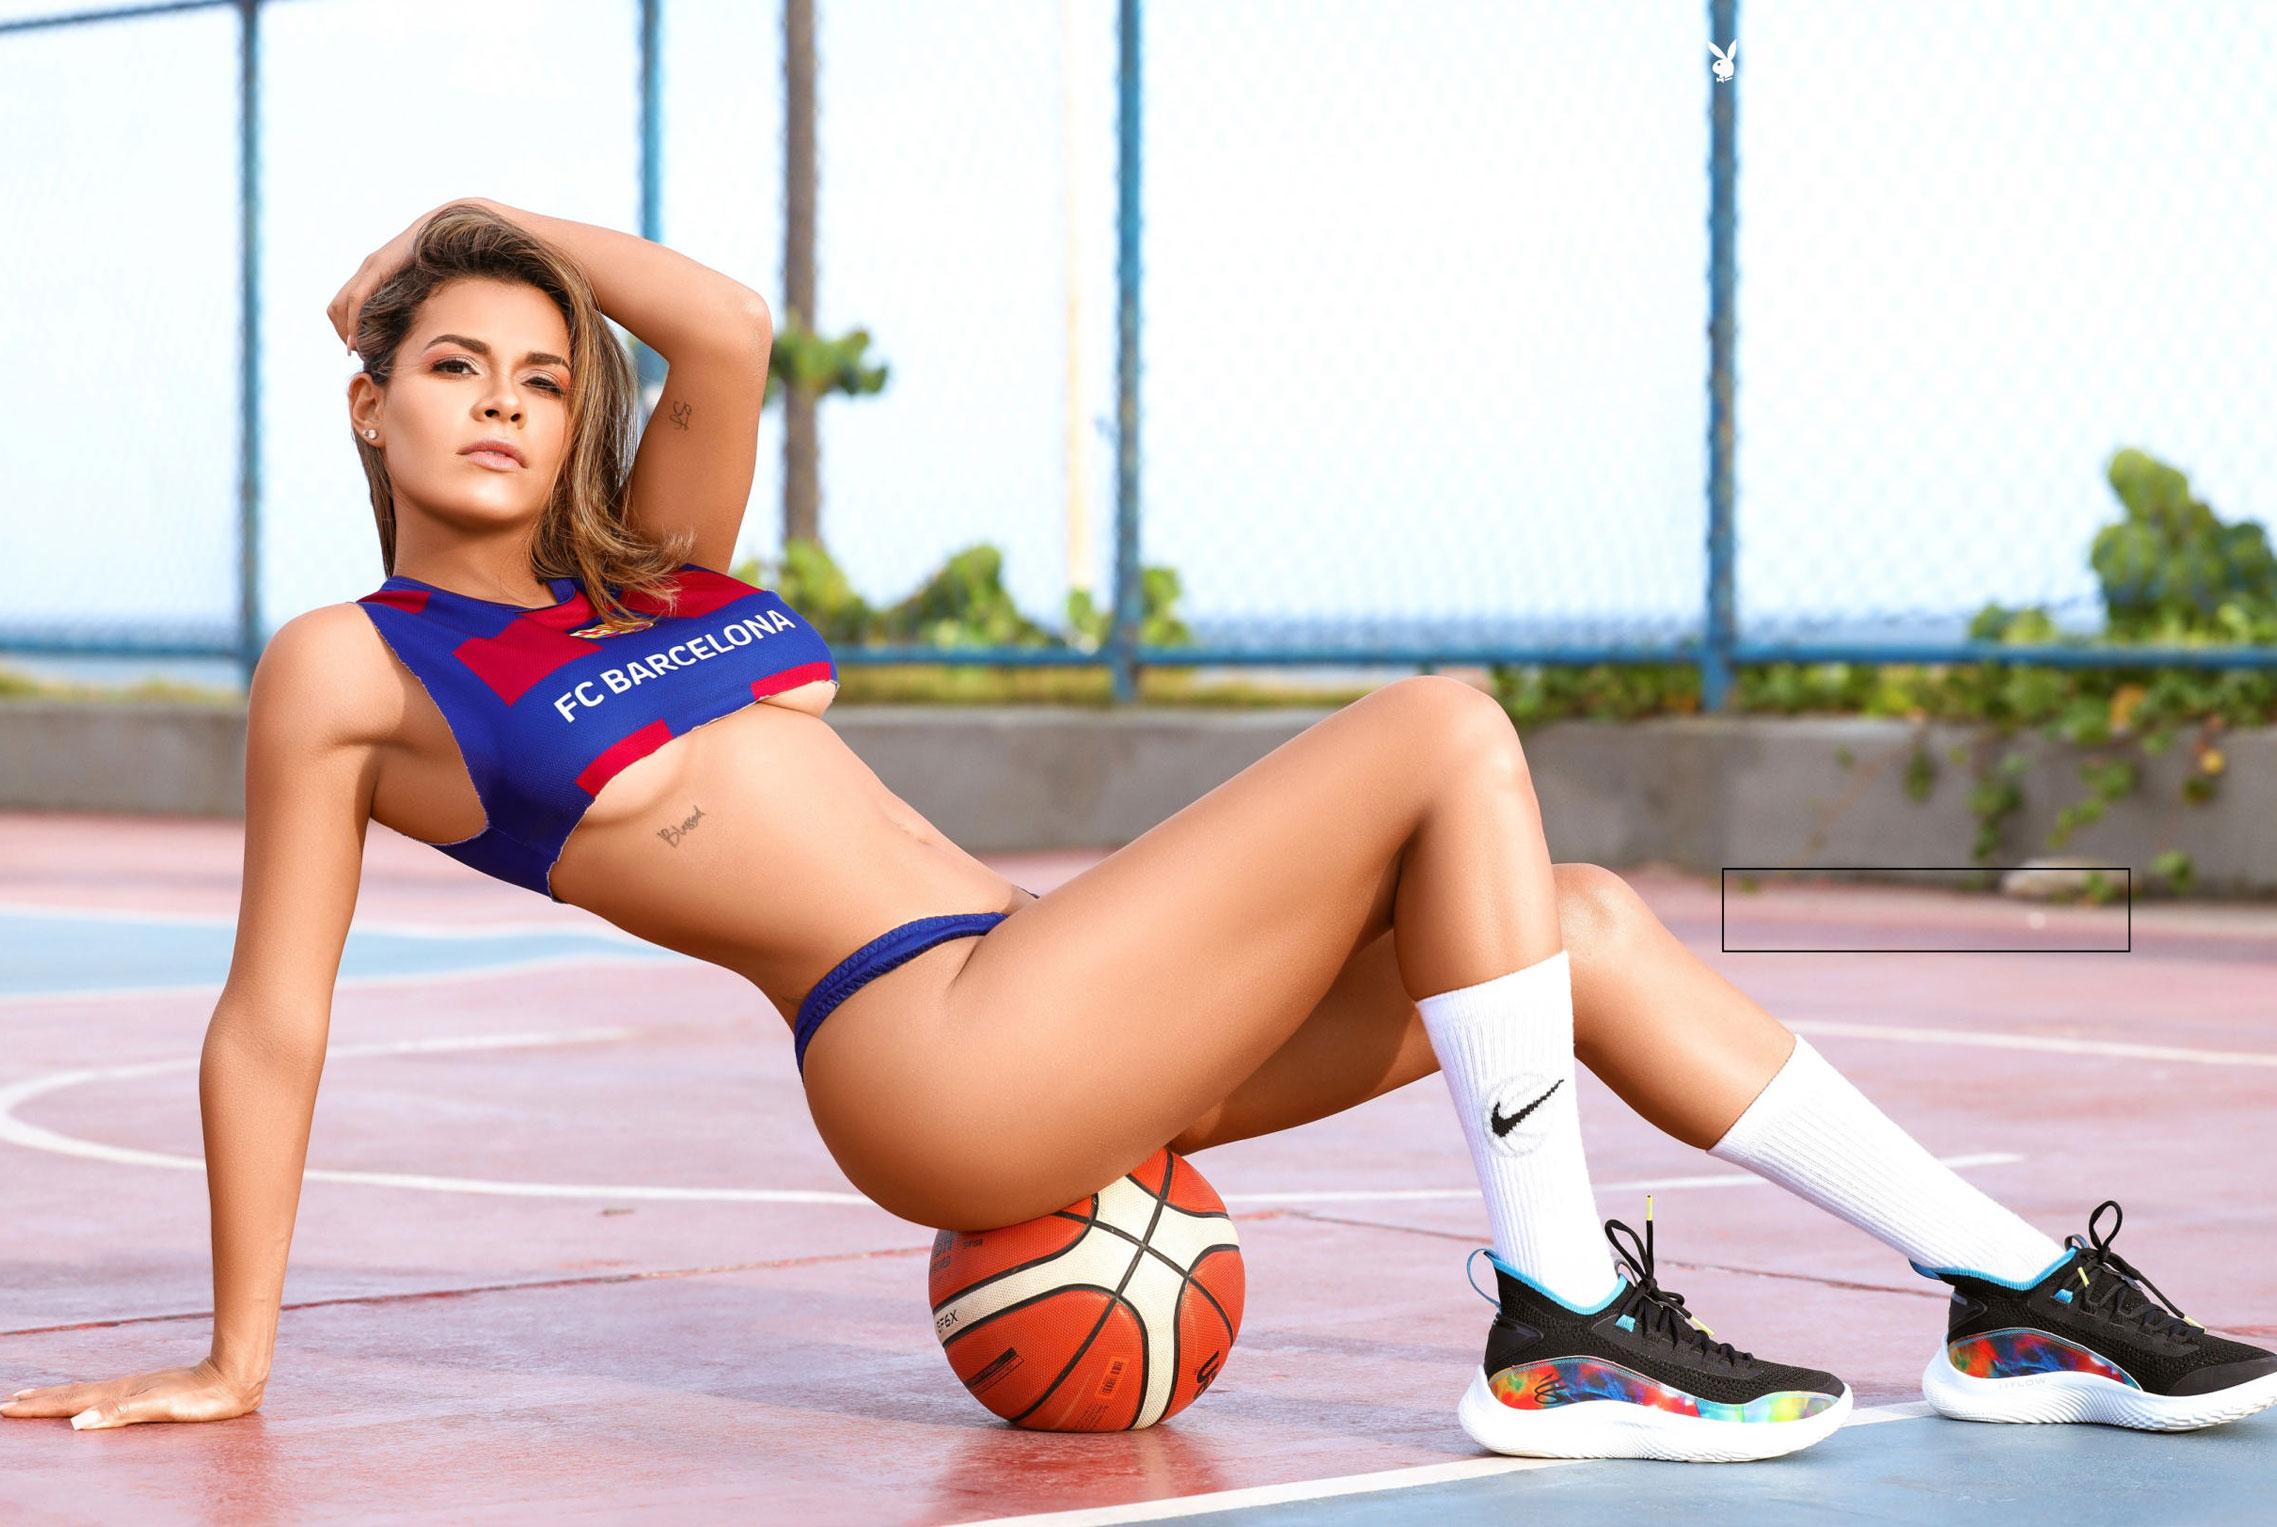 Луана Санден проводит разминку с баскетбольным мячом / фото 01